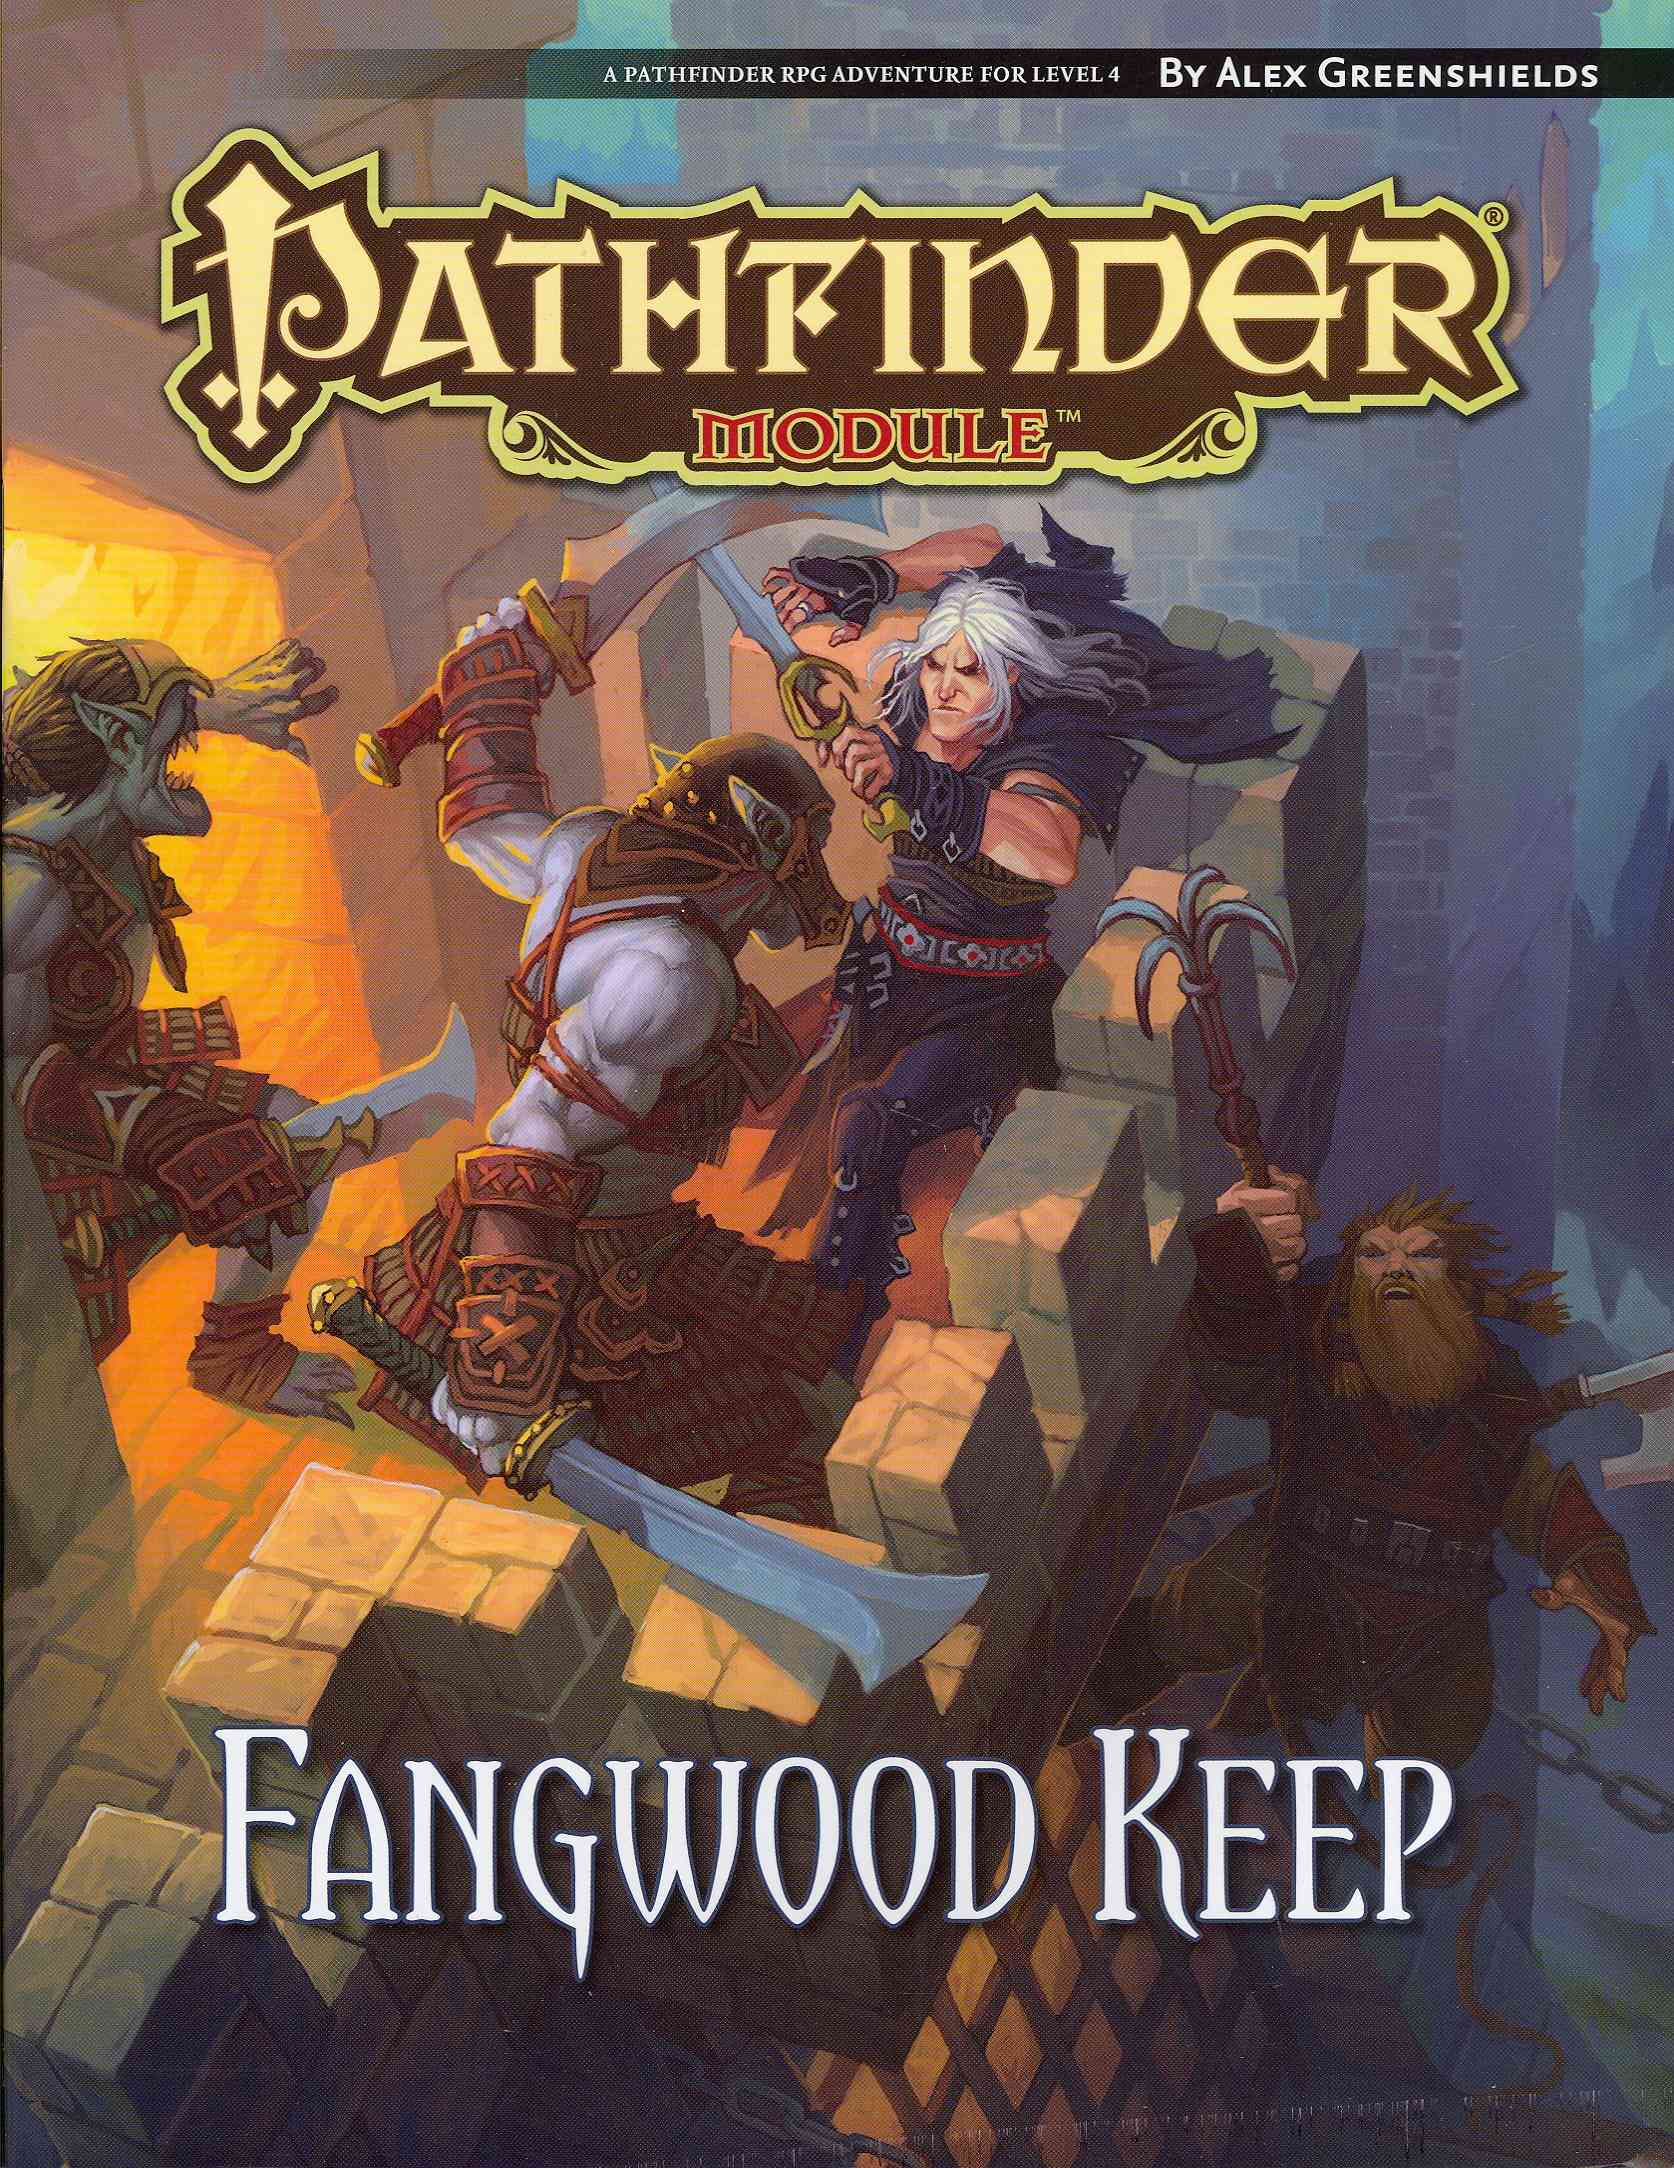 Fangwood Keep By Greenshields, Alex